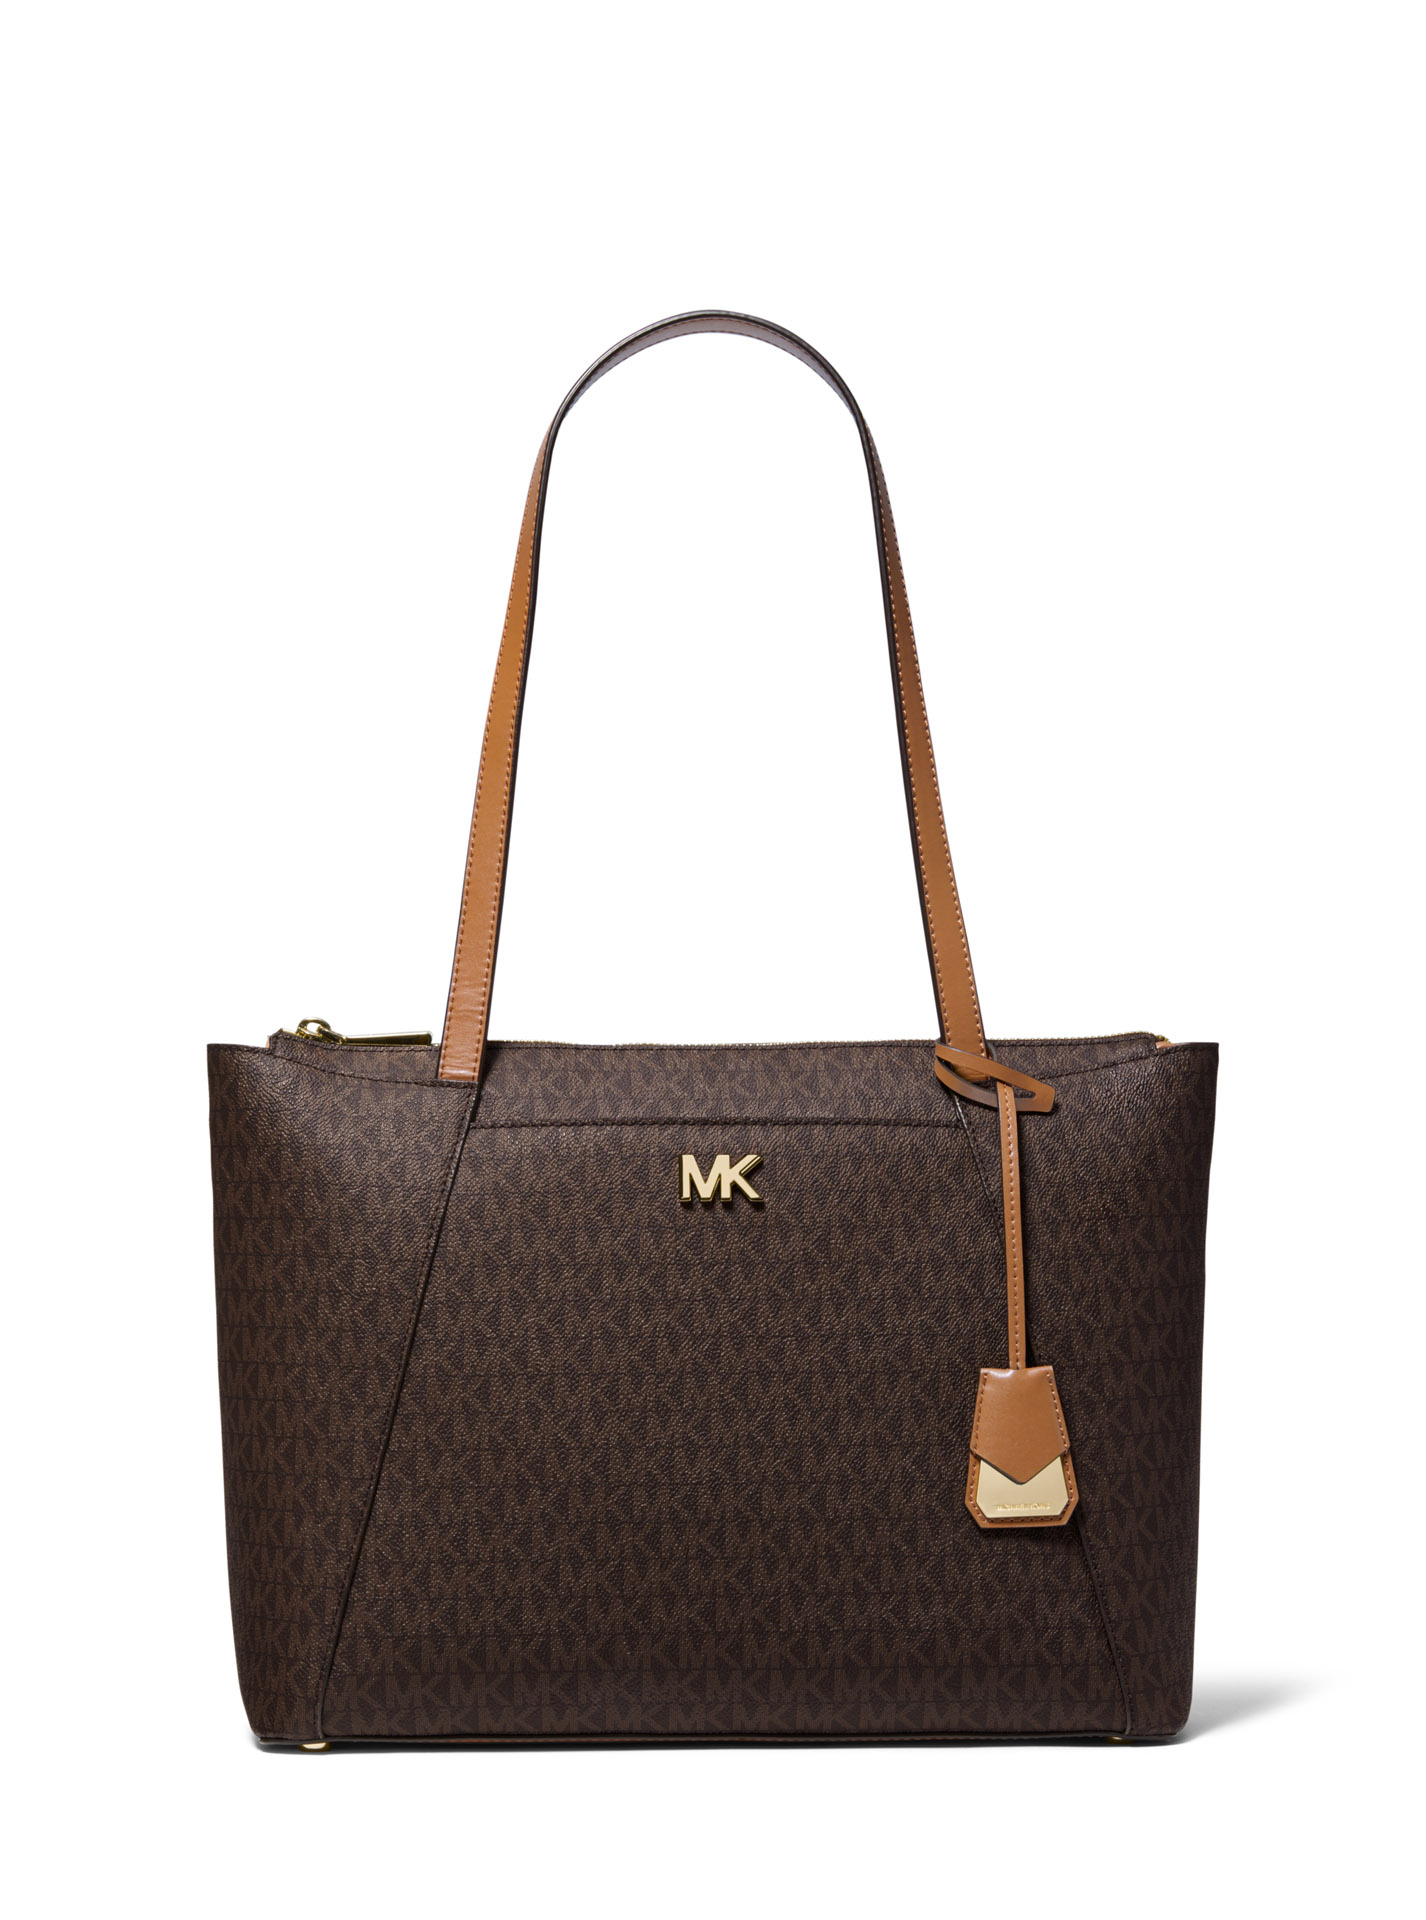 4e125e4fd7 Michael Kors Γυναικεία Τσάντα Ώμου ( Shoulder Bag   Maddie MD EW TZ Tote  LOGO ) Καφέ ( Brown   Acorn )